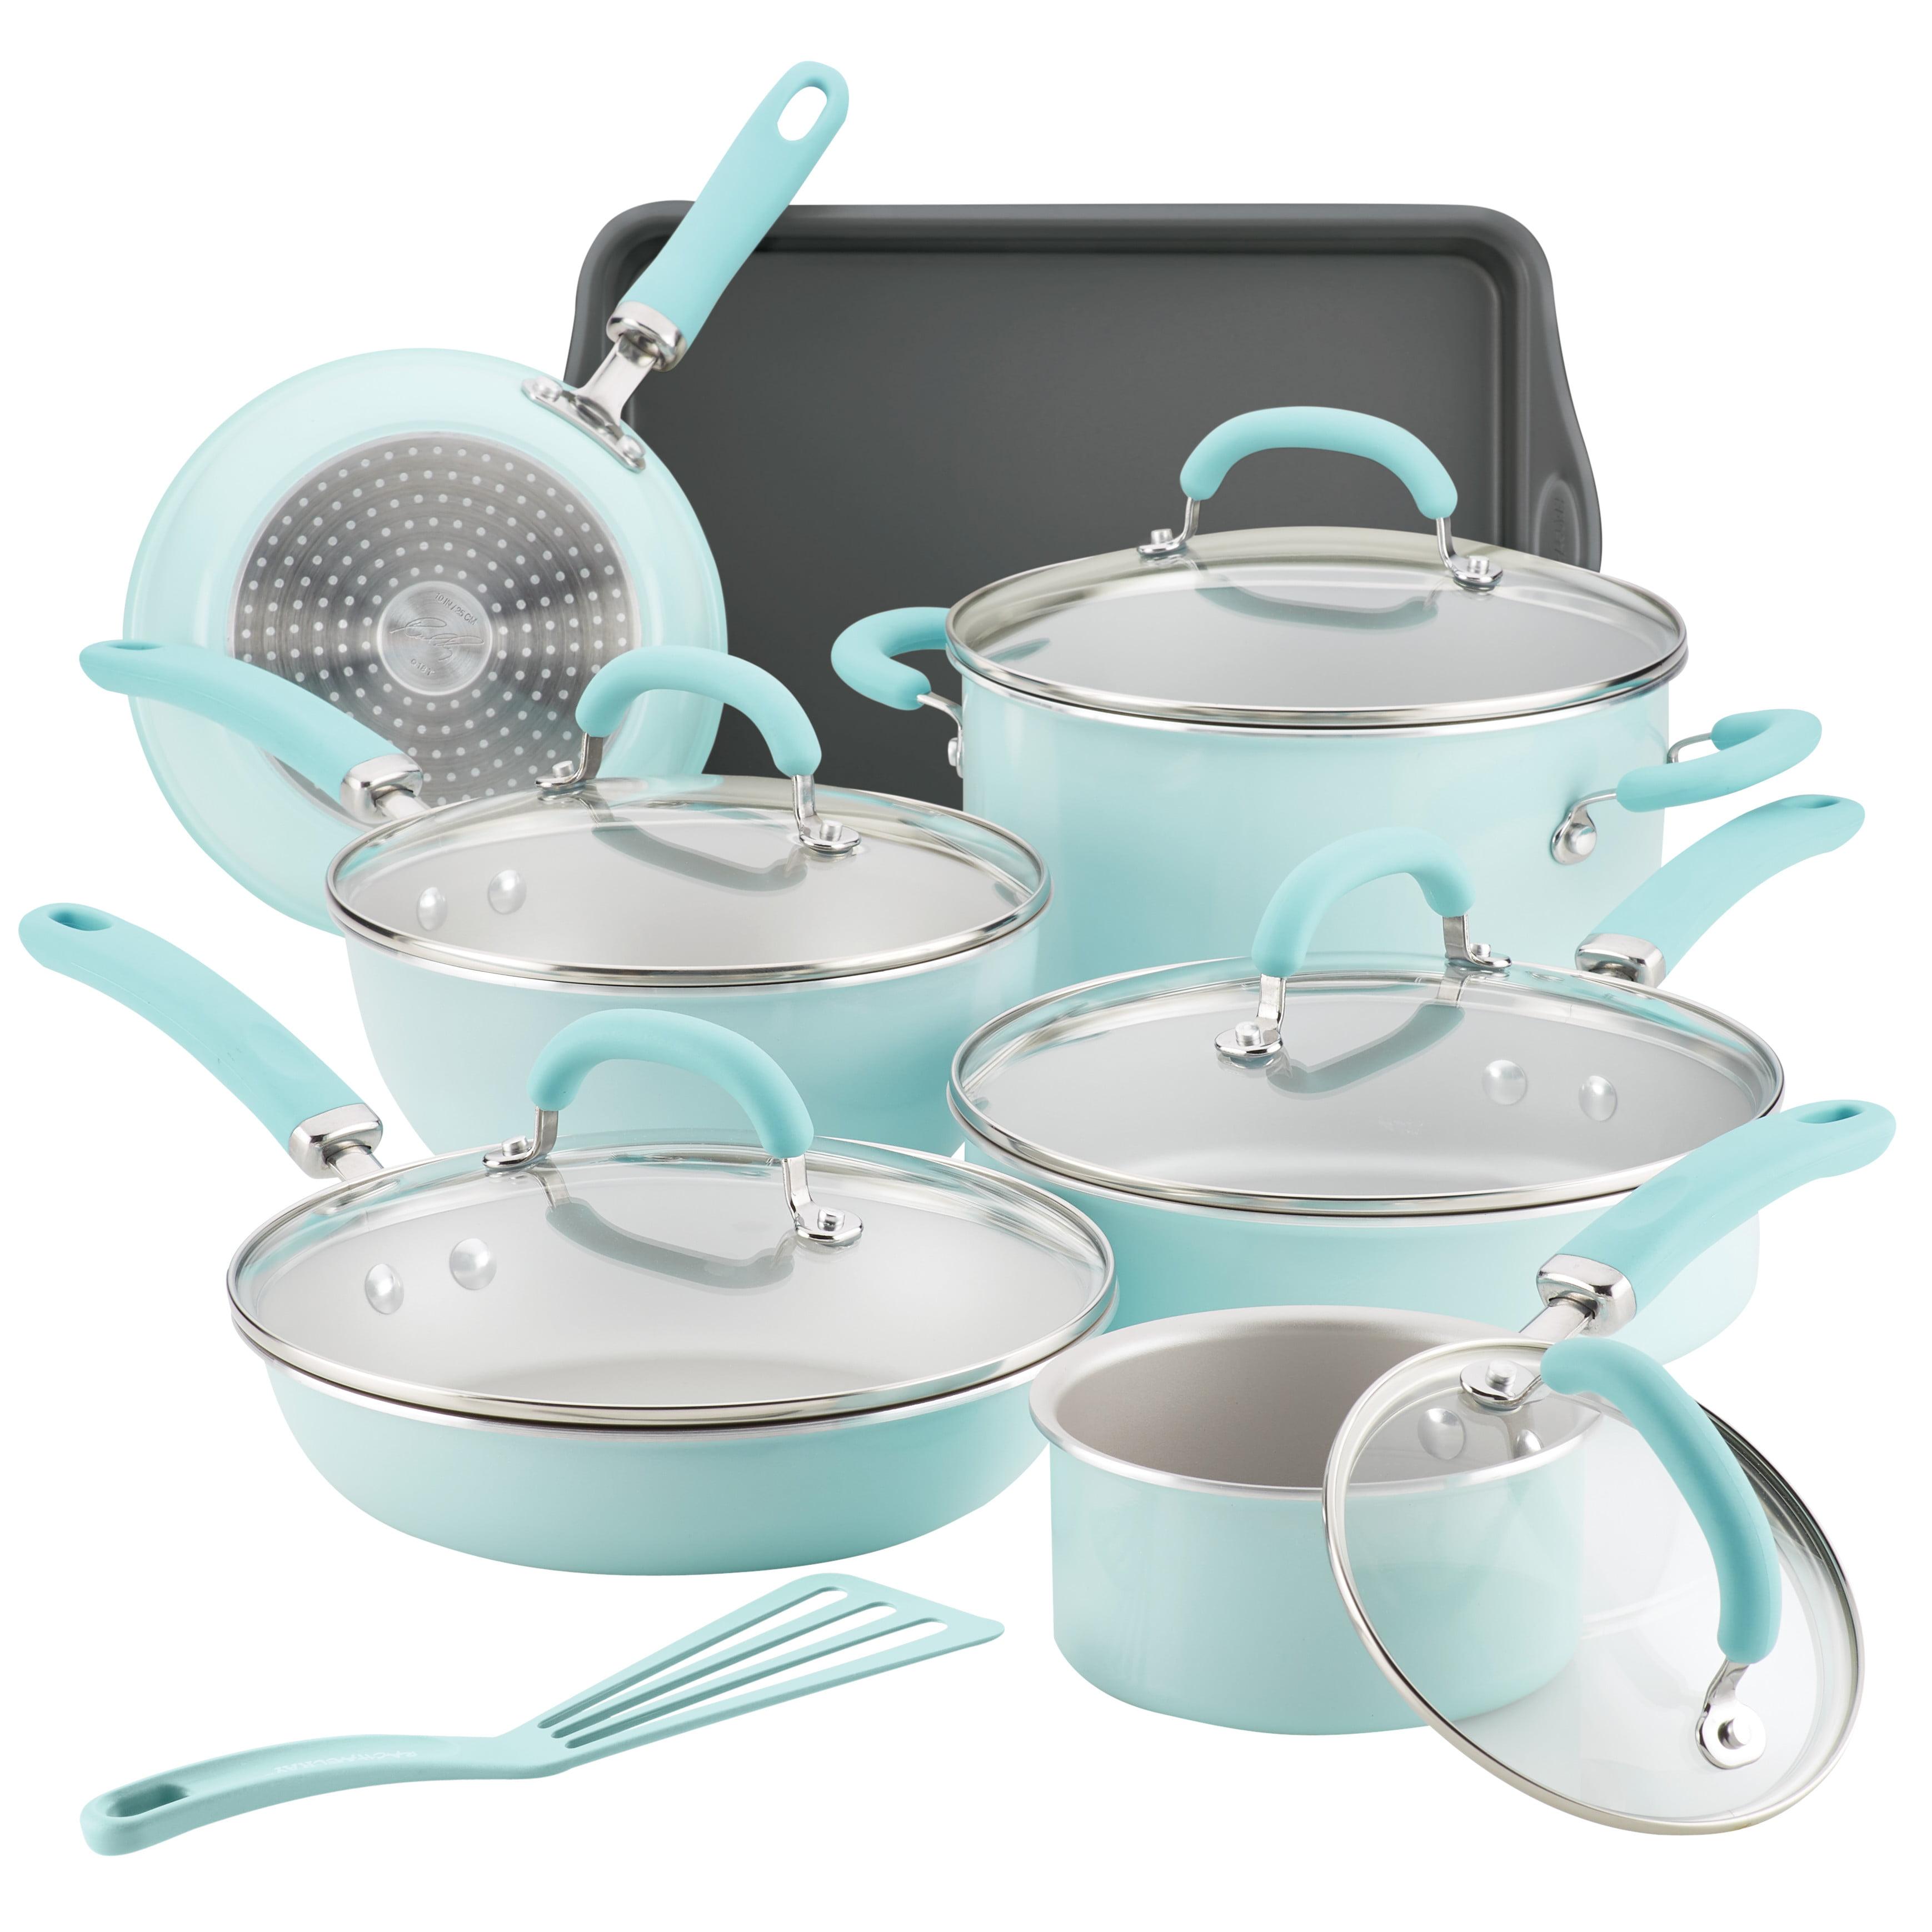 Rachael Ray 13 Pc Create Delicious Aluminum Nonstick Cookware Set, Light Blue Shimmer